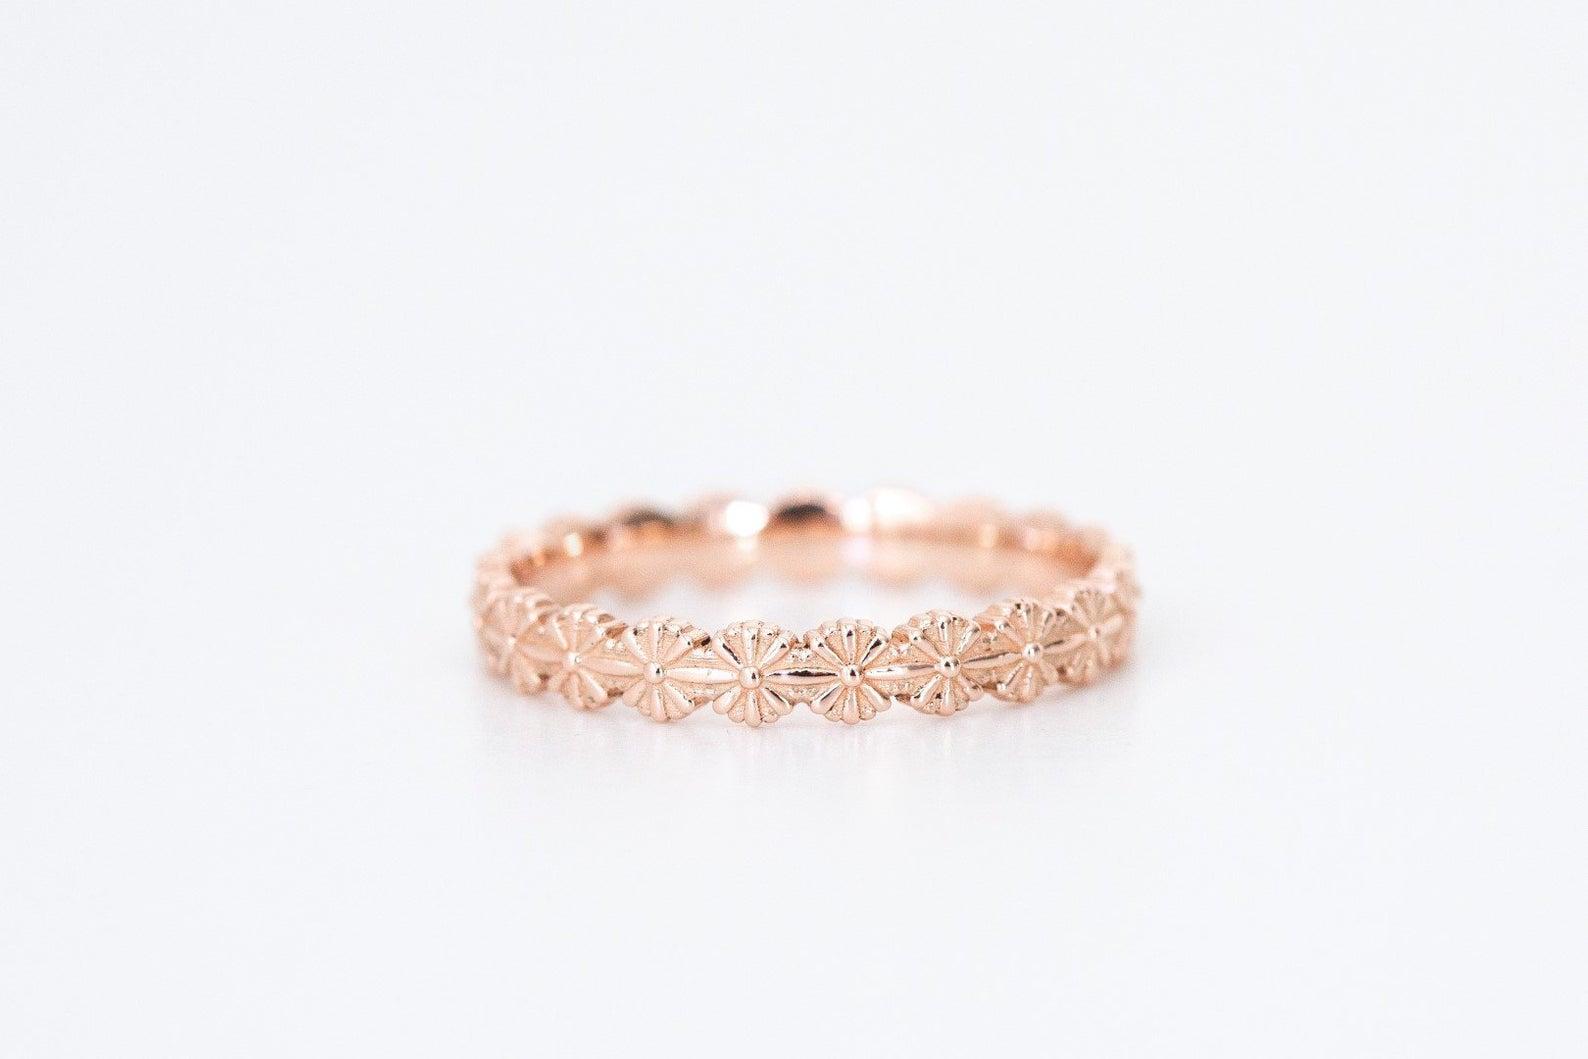 Daisy Eternity Wedding Ring Delicate Wedding Ring Rose Gold Ring Yellow Gold Ring Unique Wedding Ring Flower Wedding Band Gift For Her Wedding Rings Unique Delicate Wedding Ring Wedding Rings